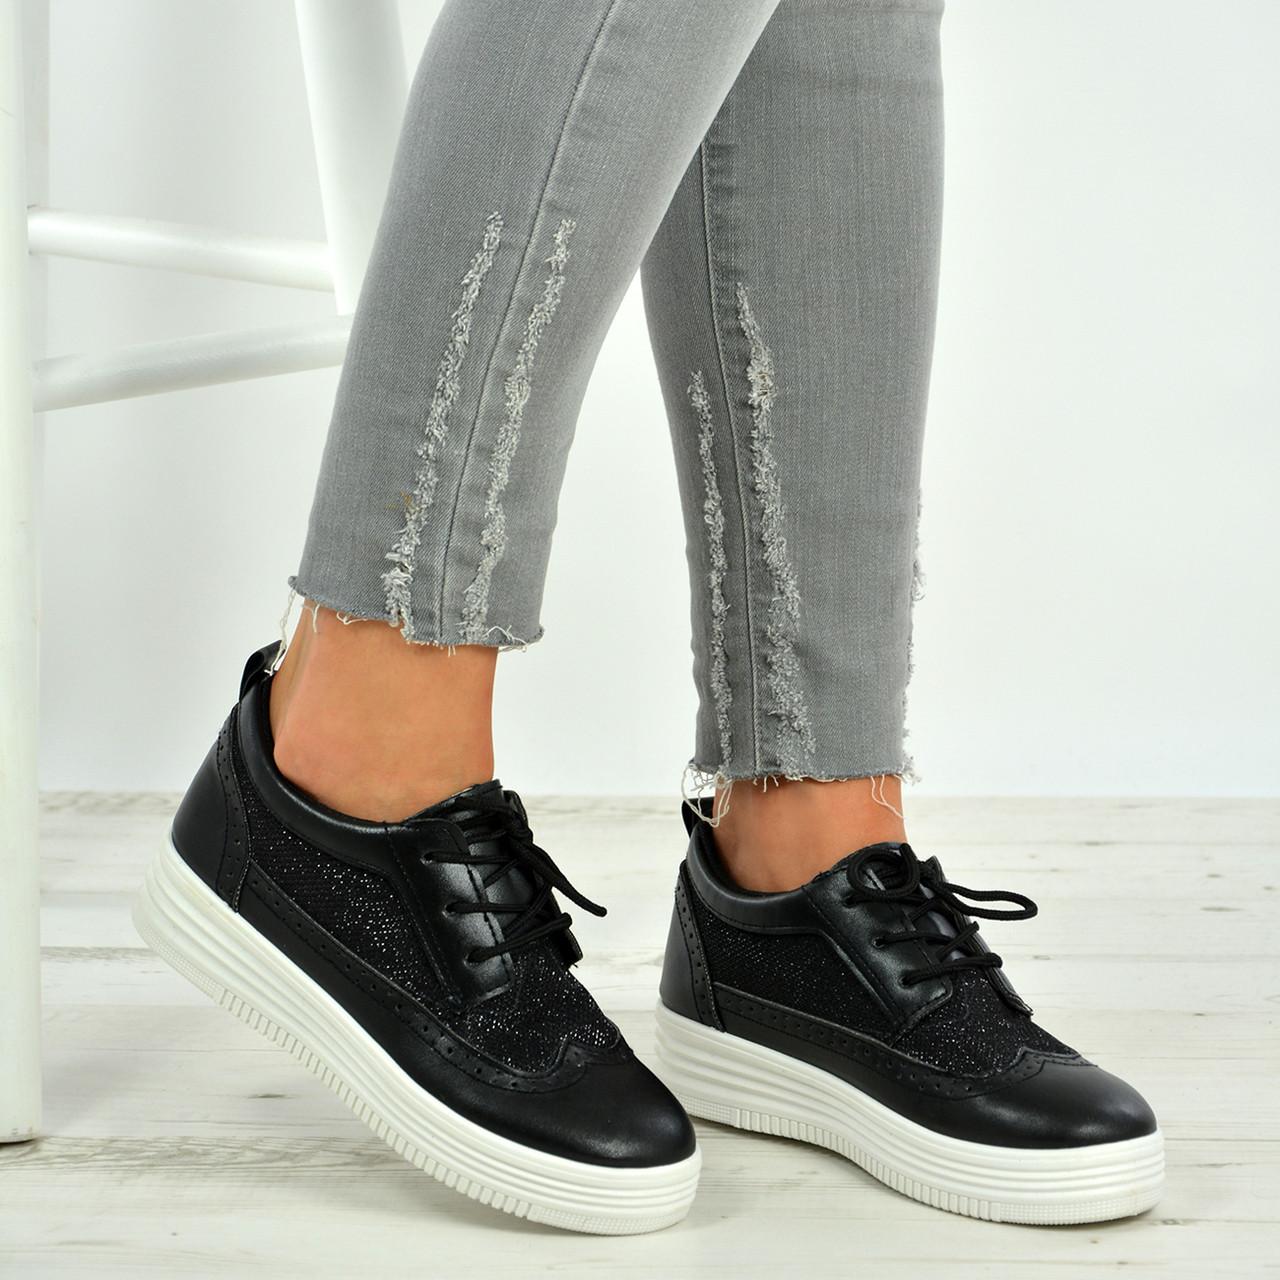 1d151fb2a4b1 New Womens Ladies Glitter Sparkle Lace Up Oxfords Plimsolls Trainers Shoes  Size